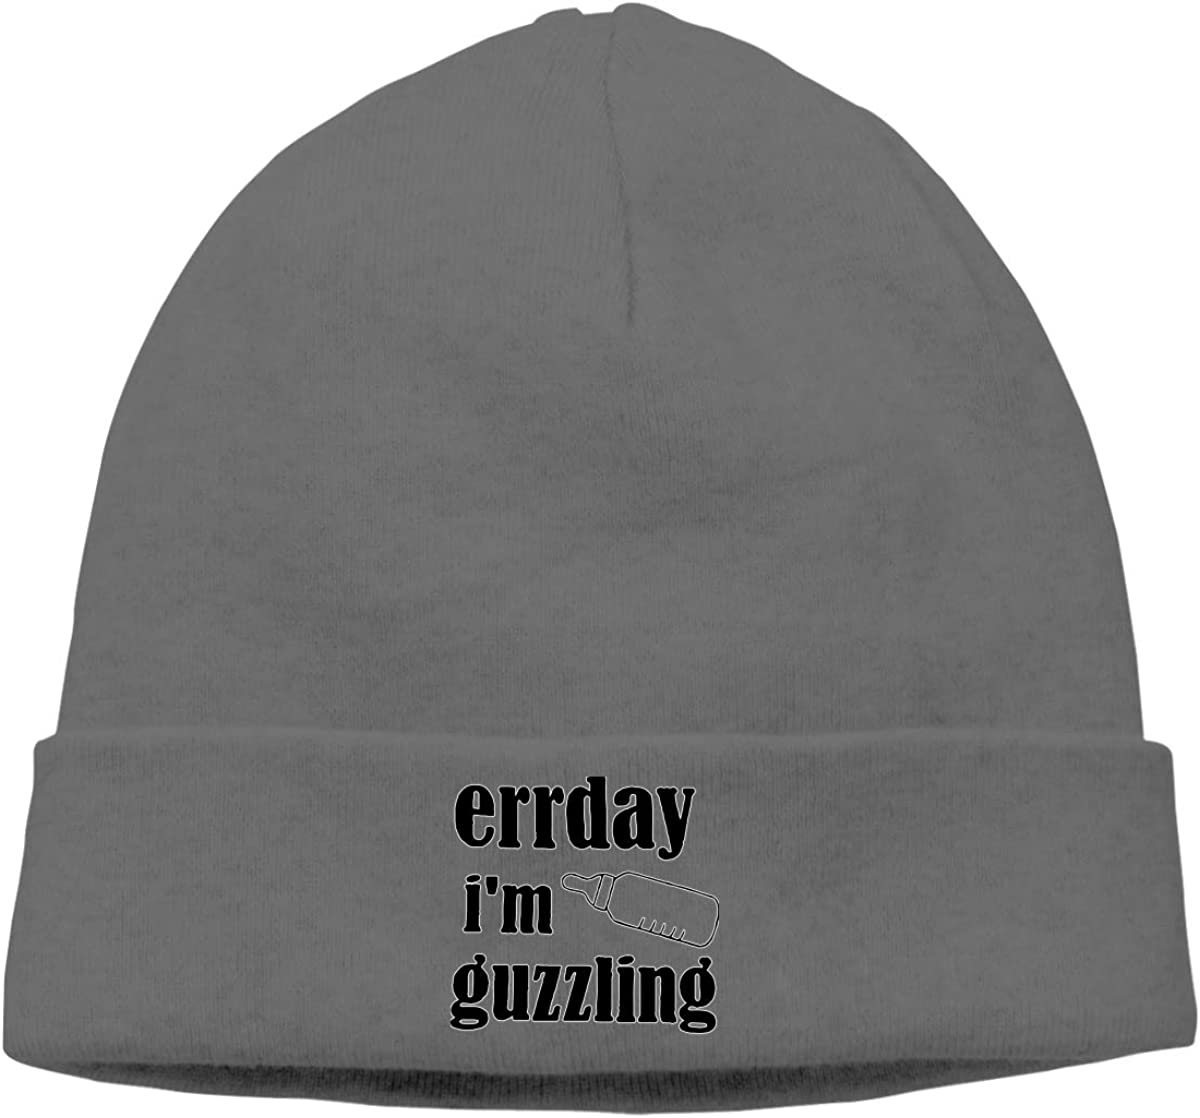 Nskngr Errday Im Guzzling Cap Mens/&Womens Deliciously Soft Daily Serious Beanies Beanie Skull Cap